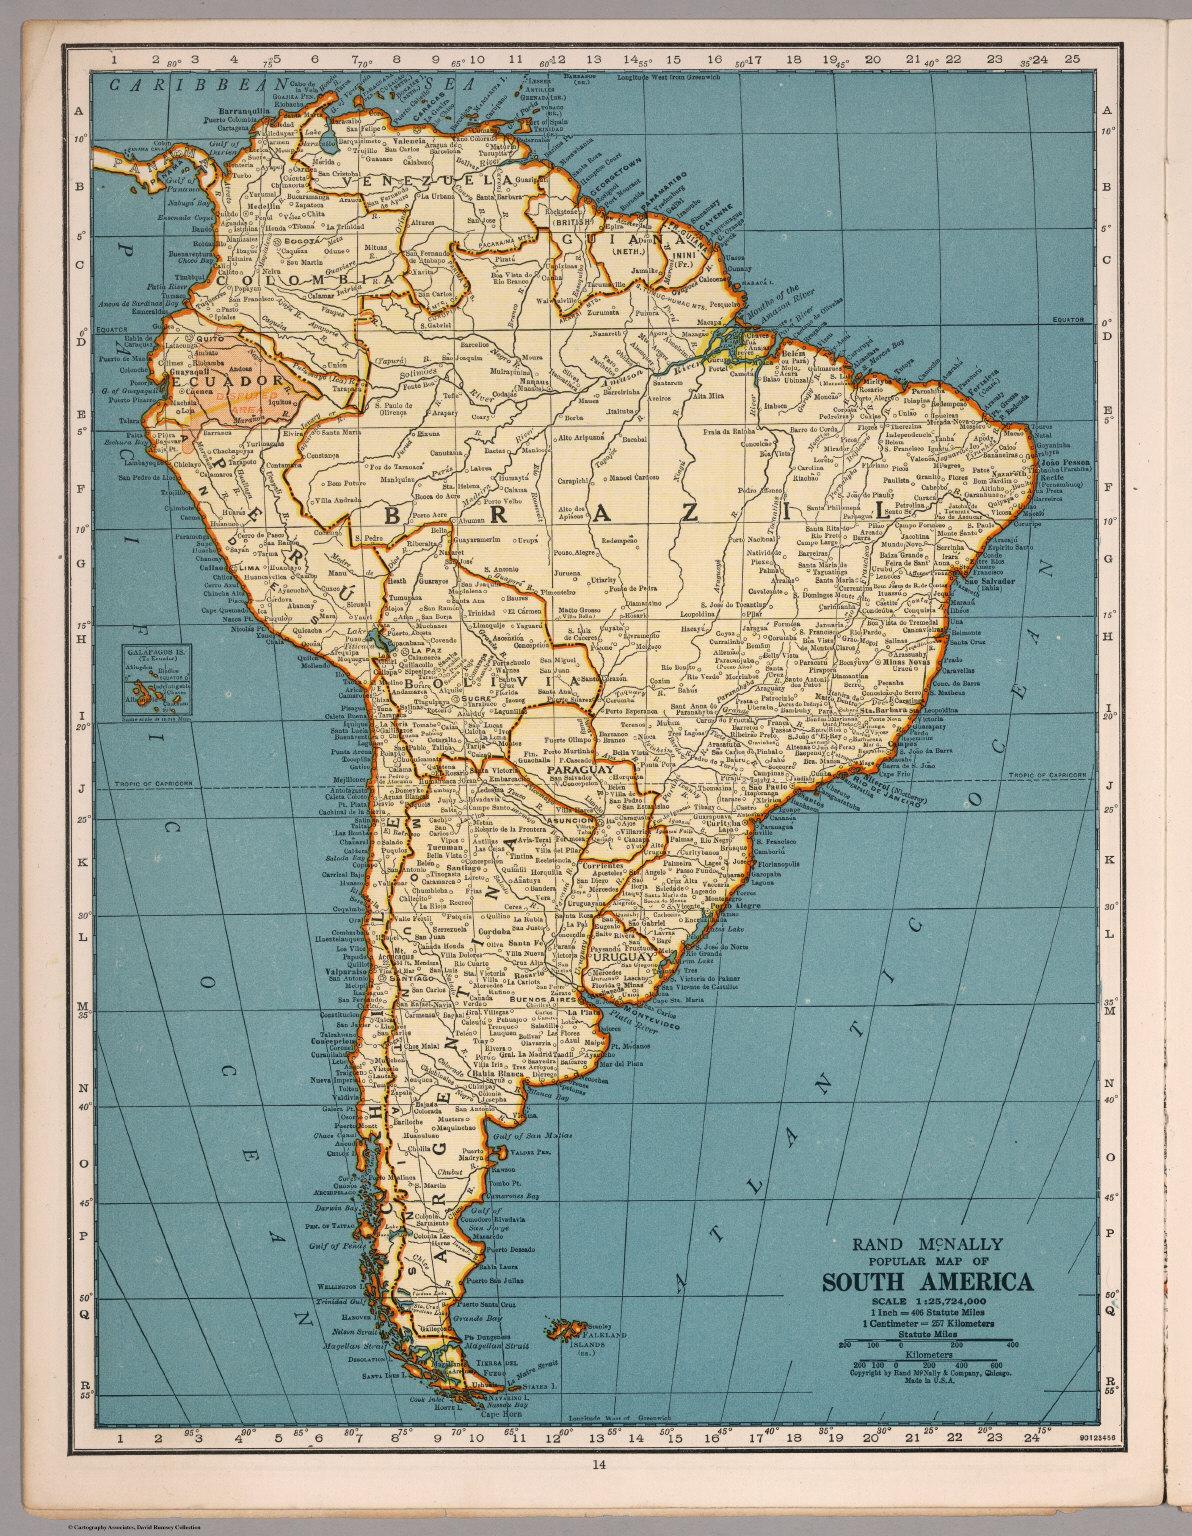 Rand McNally Popular map South America David Rumsey Historical